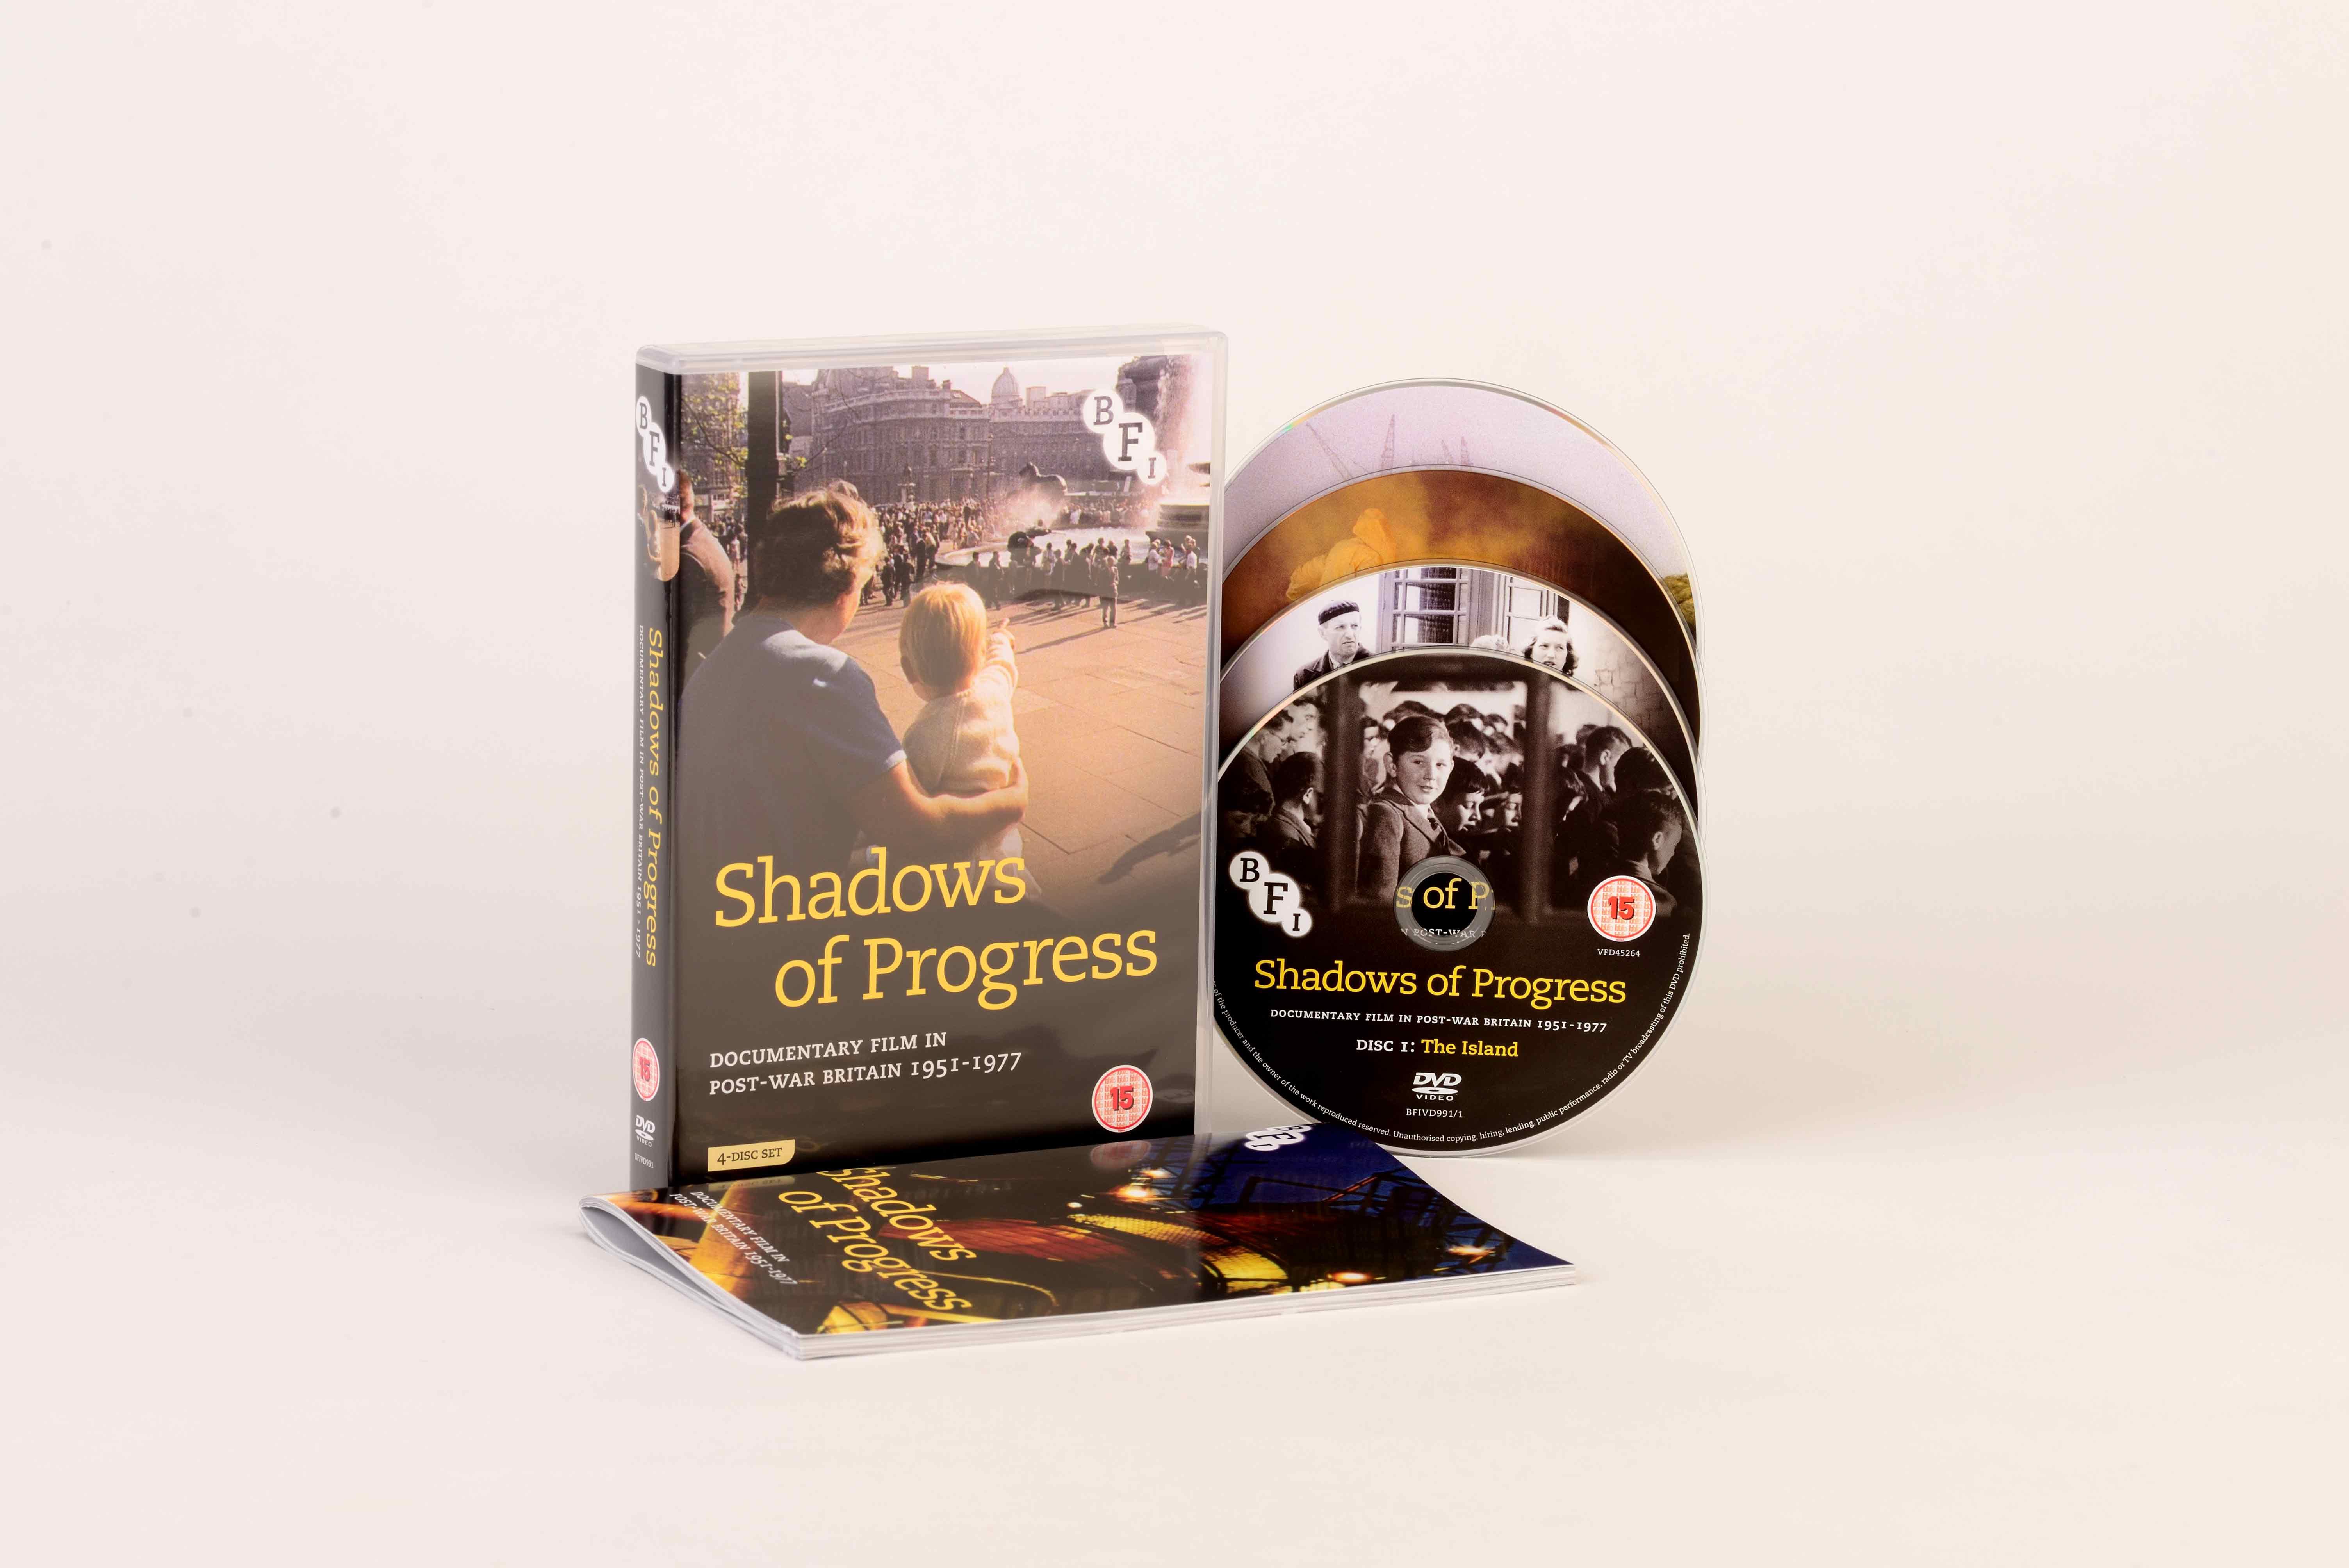 Buy Shadows of Progress (4-DVD set)